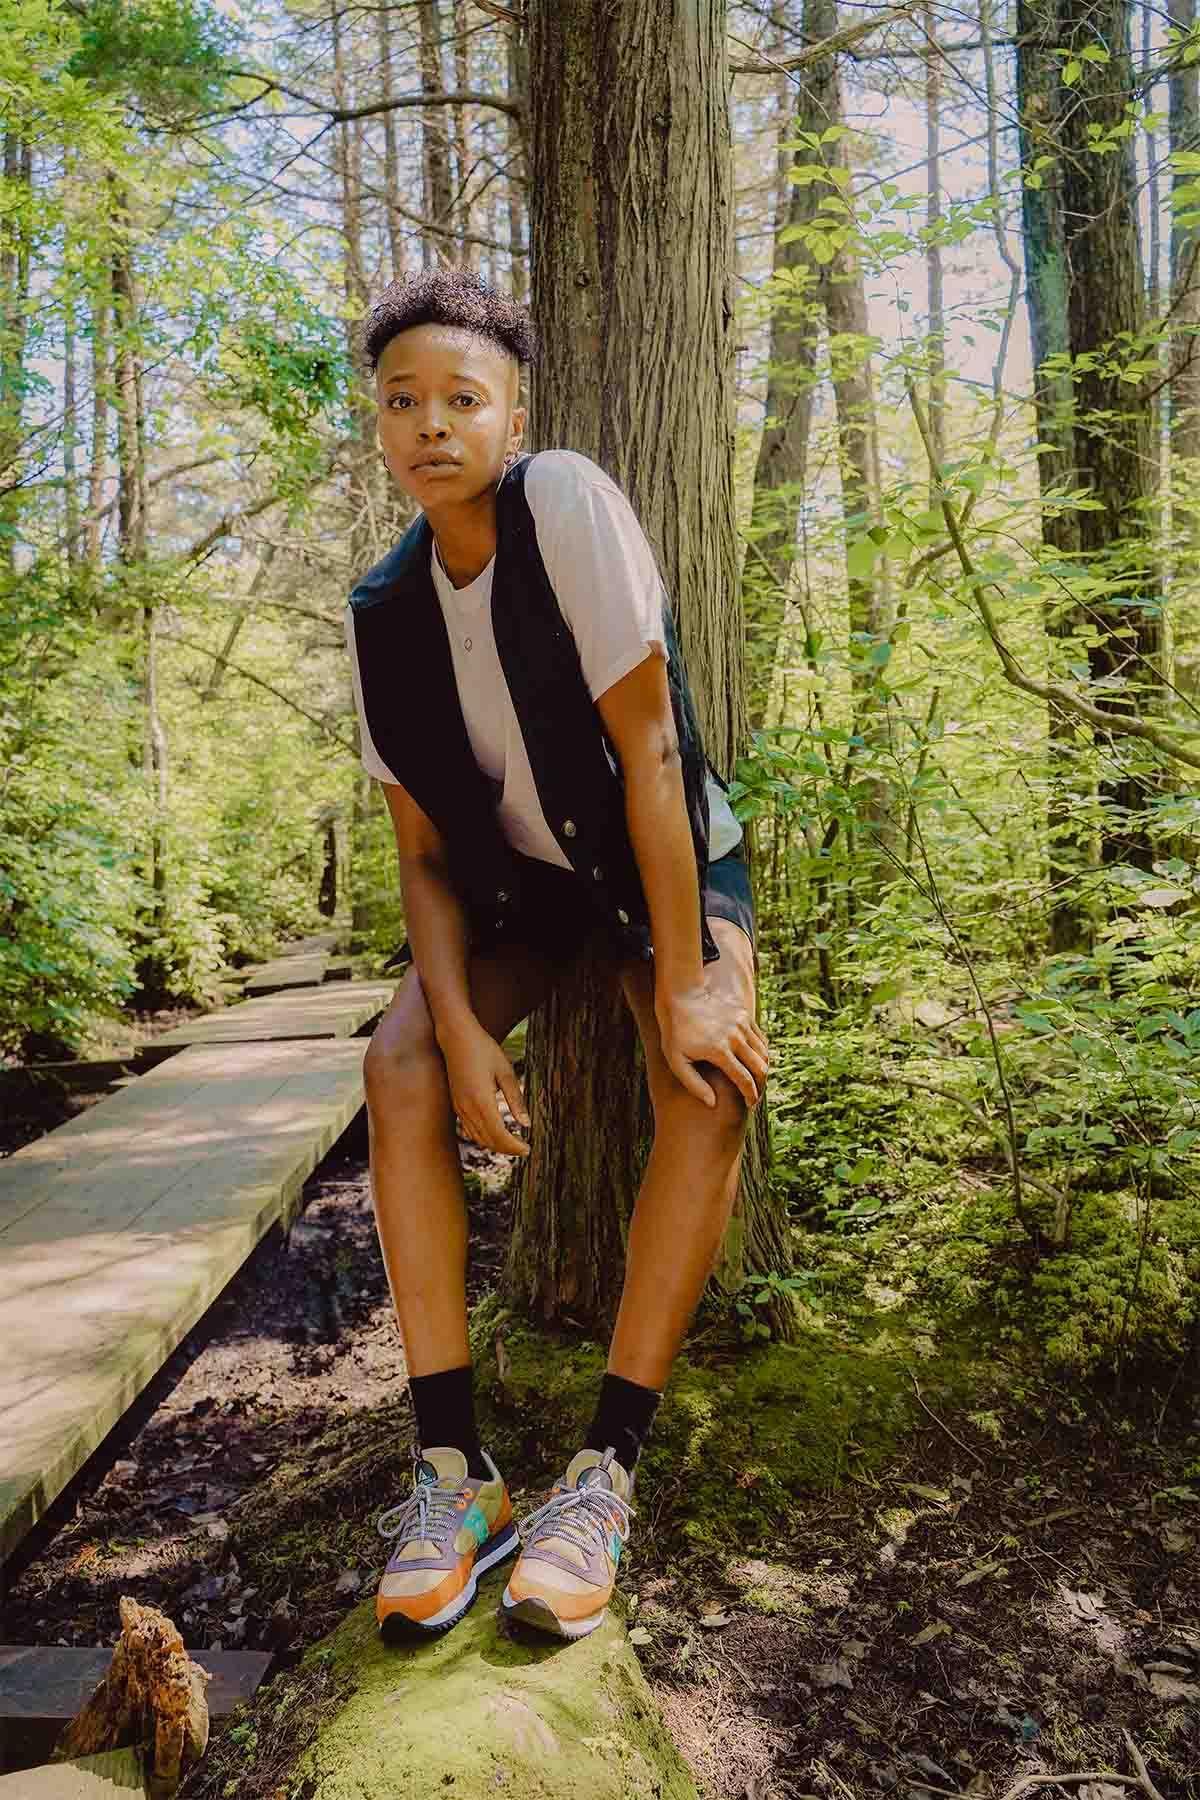 Take a Hike in Saucony's Jazz Original 'Peak' Pack 17